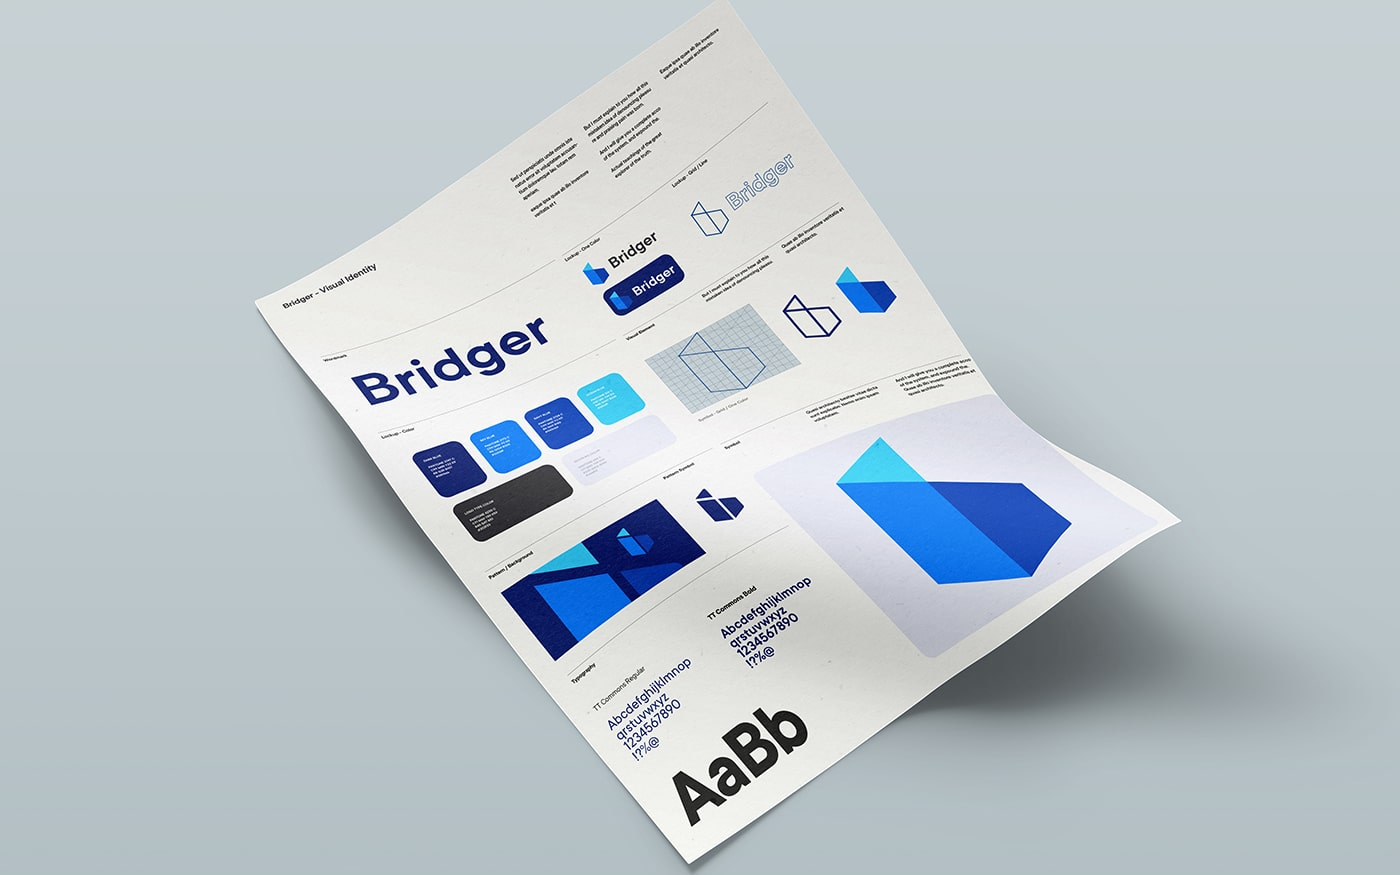 bridger-visual-identity